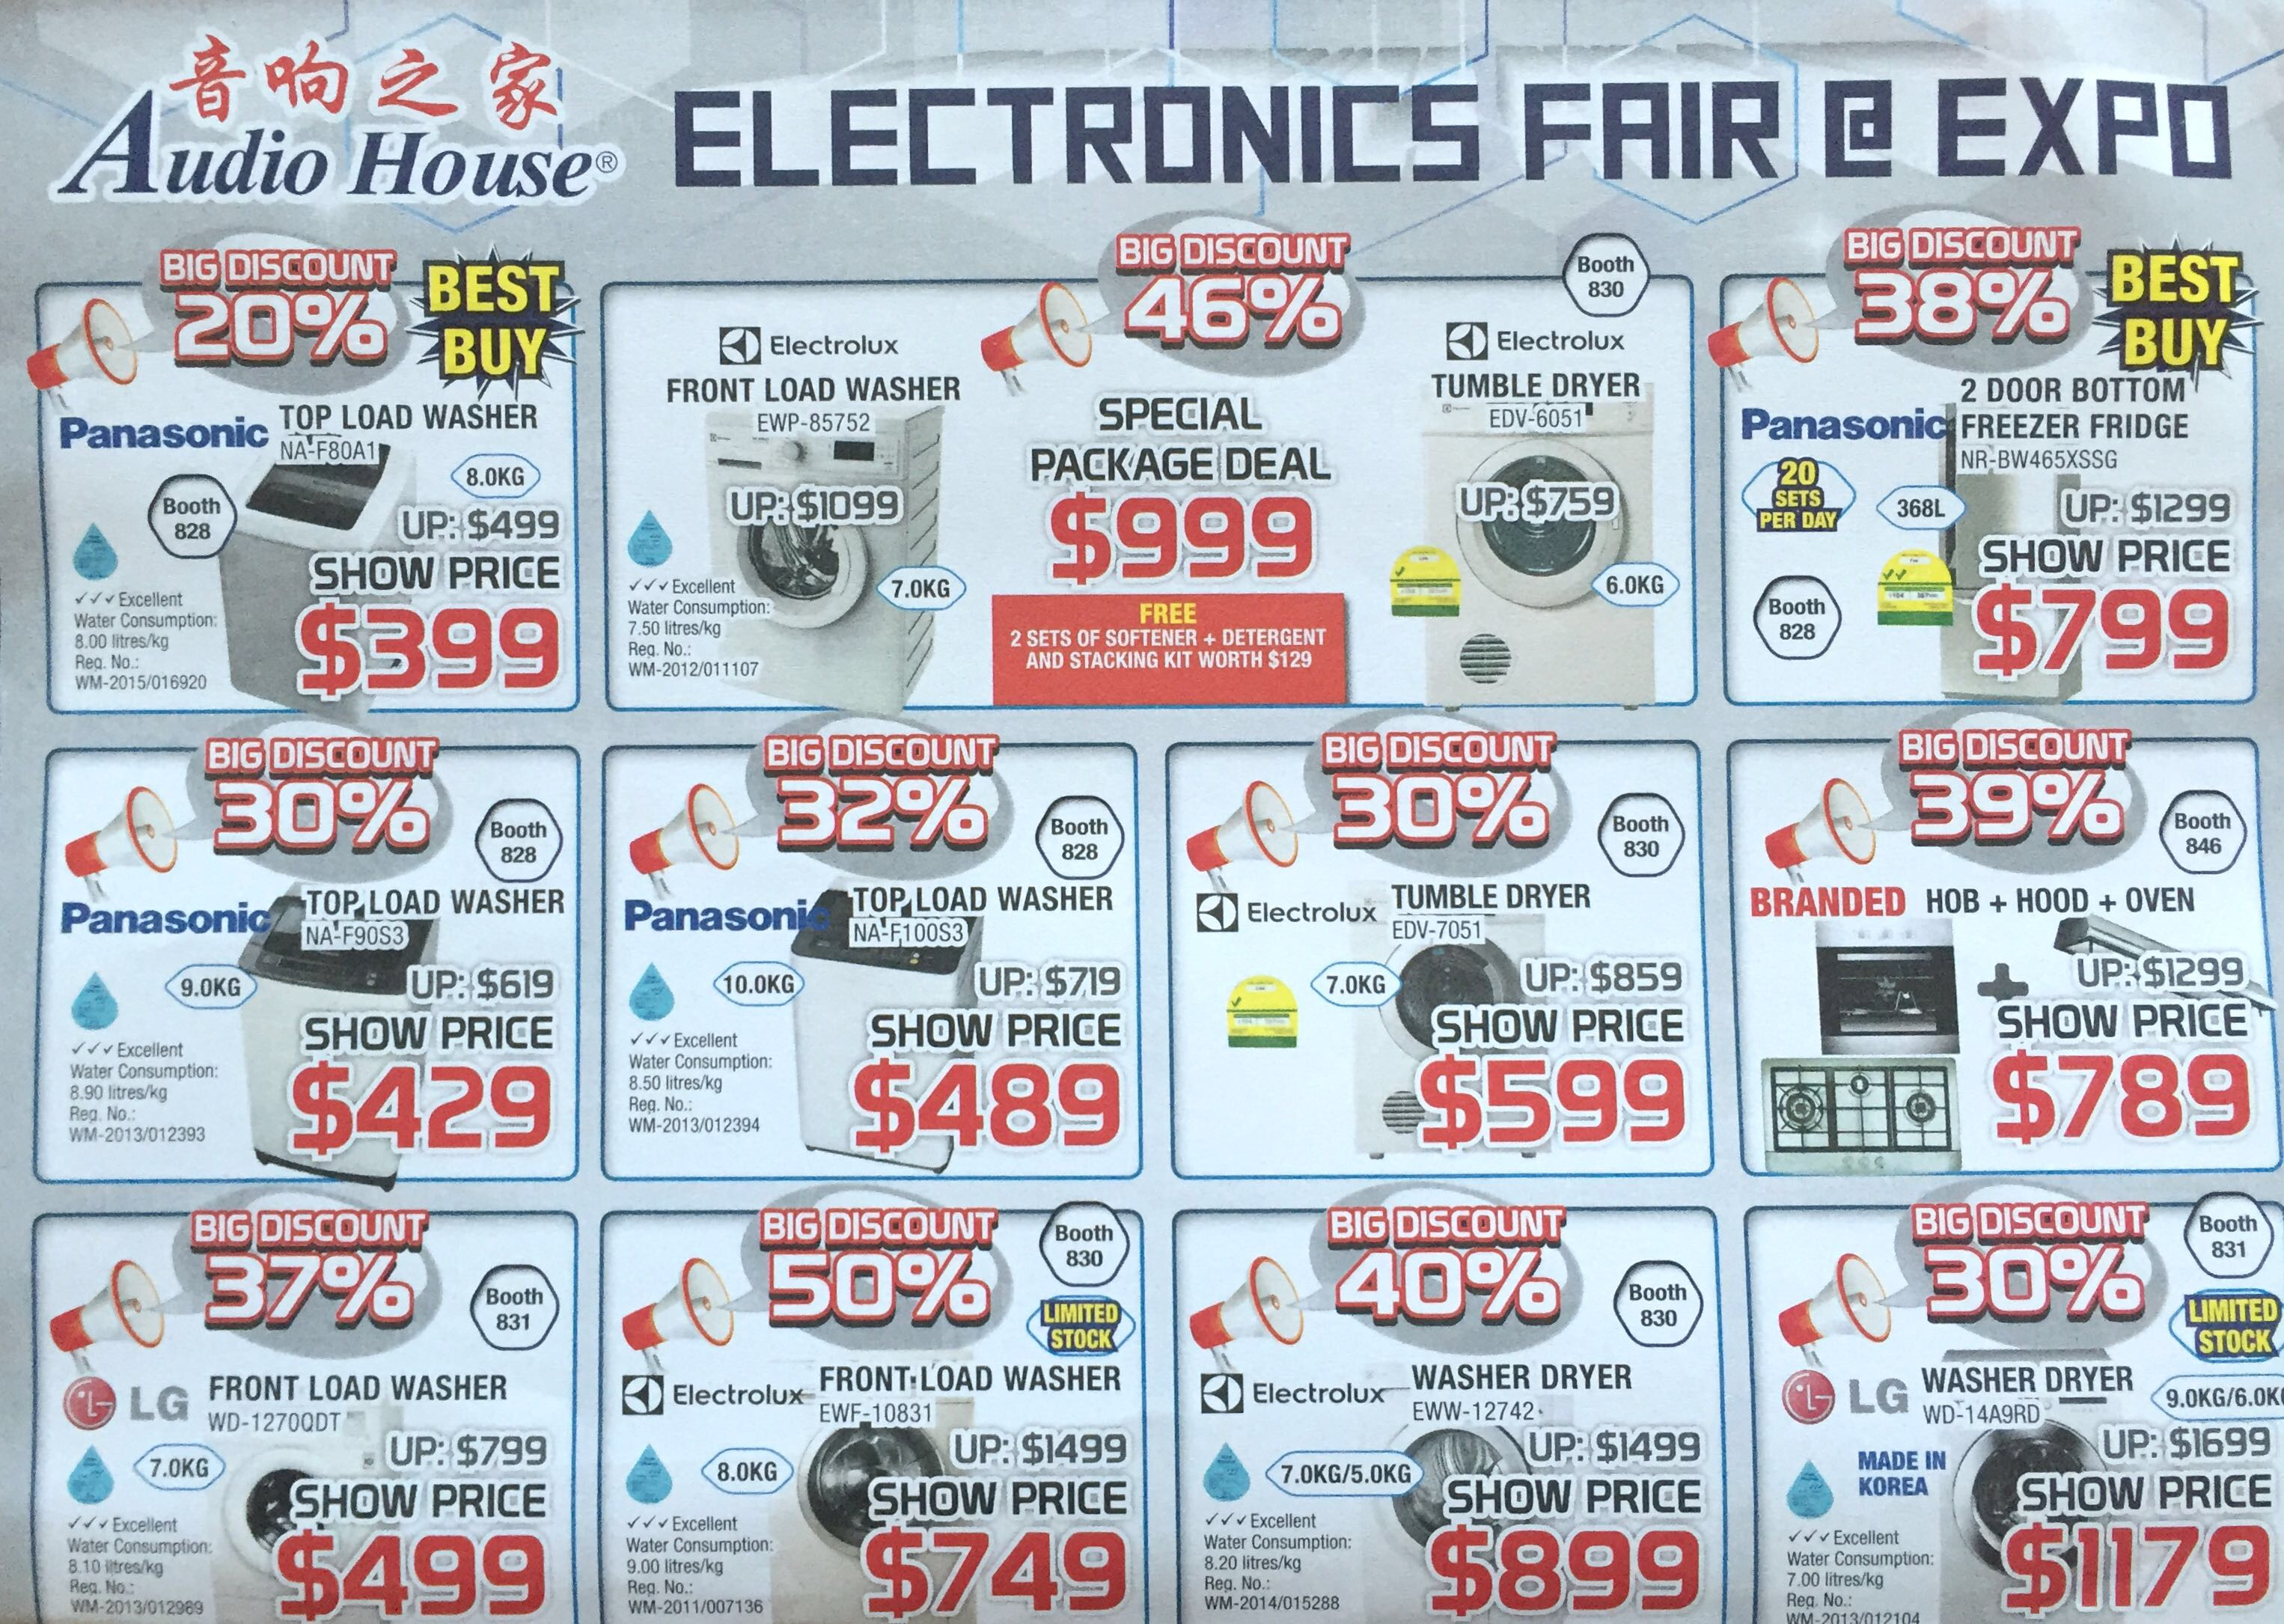 Electronics Fair @ EXPO   8 - 10 January 2016   by Audio House   pg4